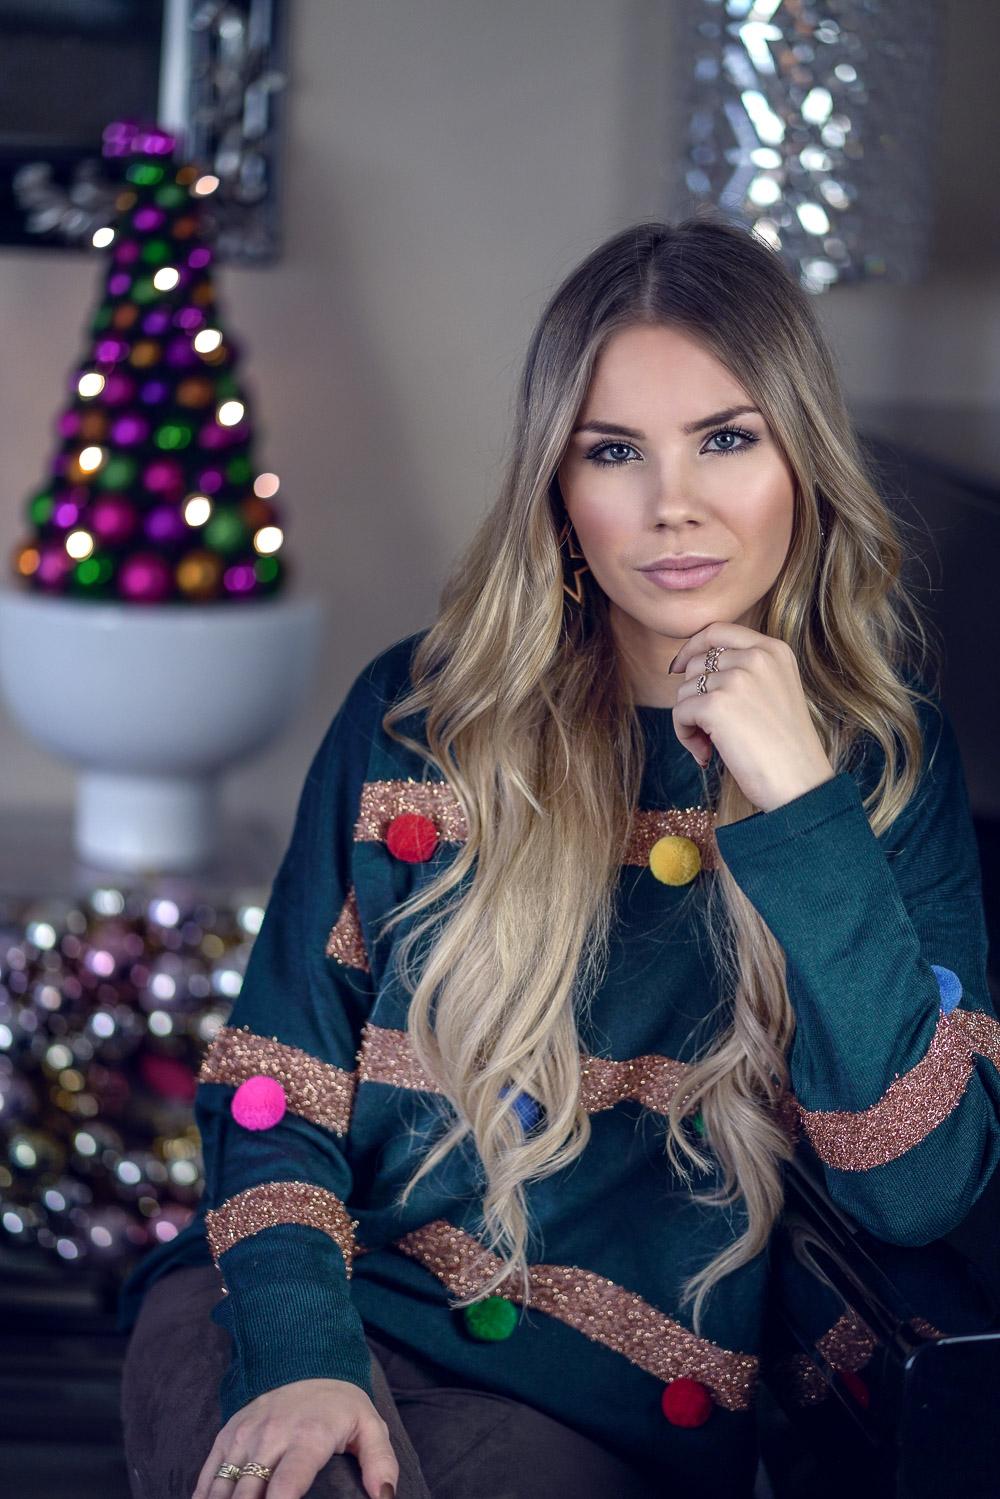 Weihnachtspullover: Der Ugly Christmas Sweater Trend! - TheRubinRose